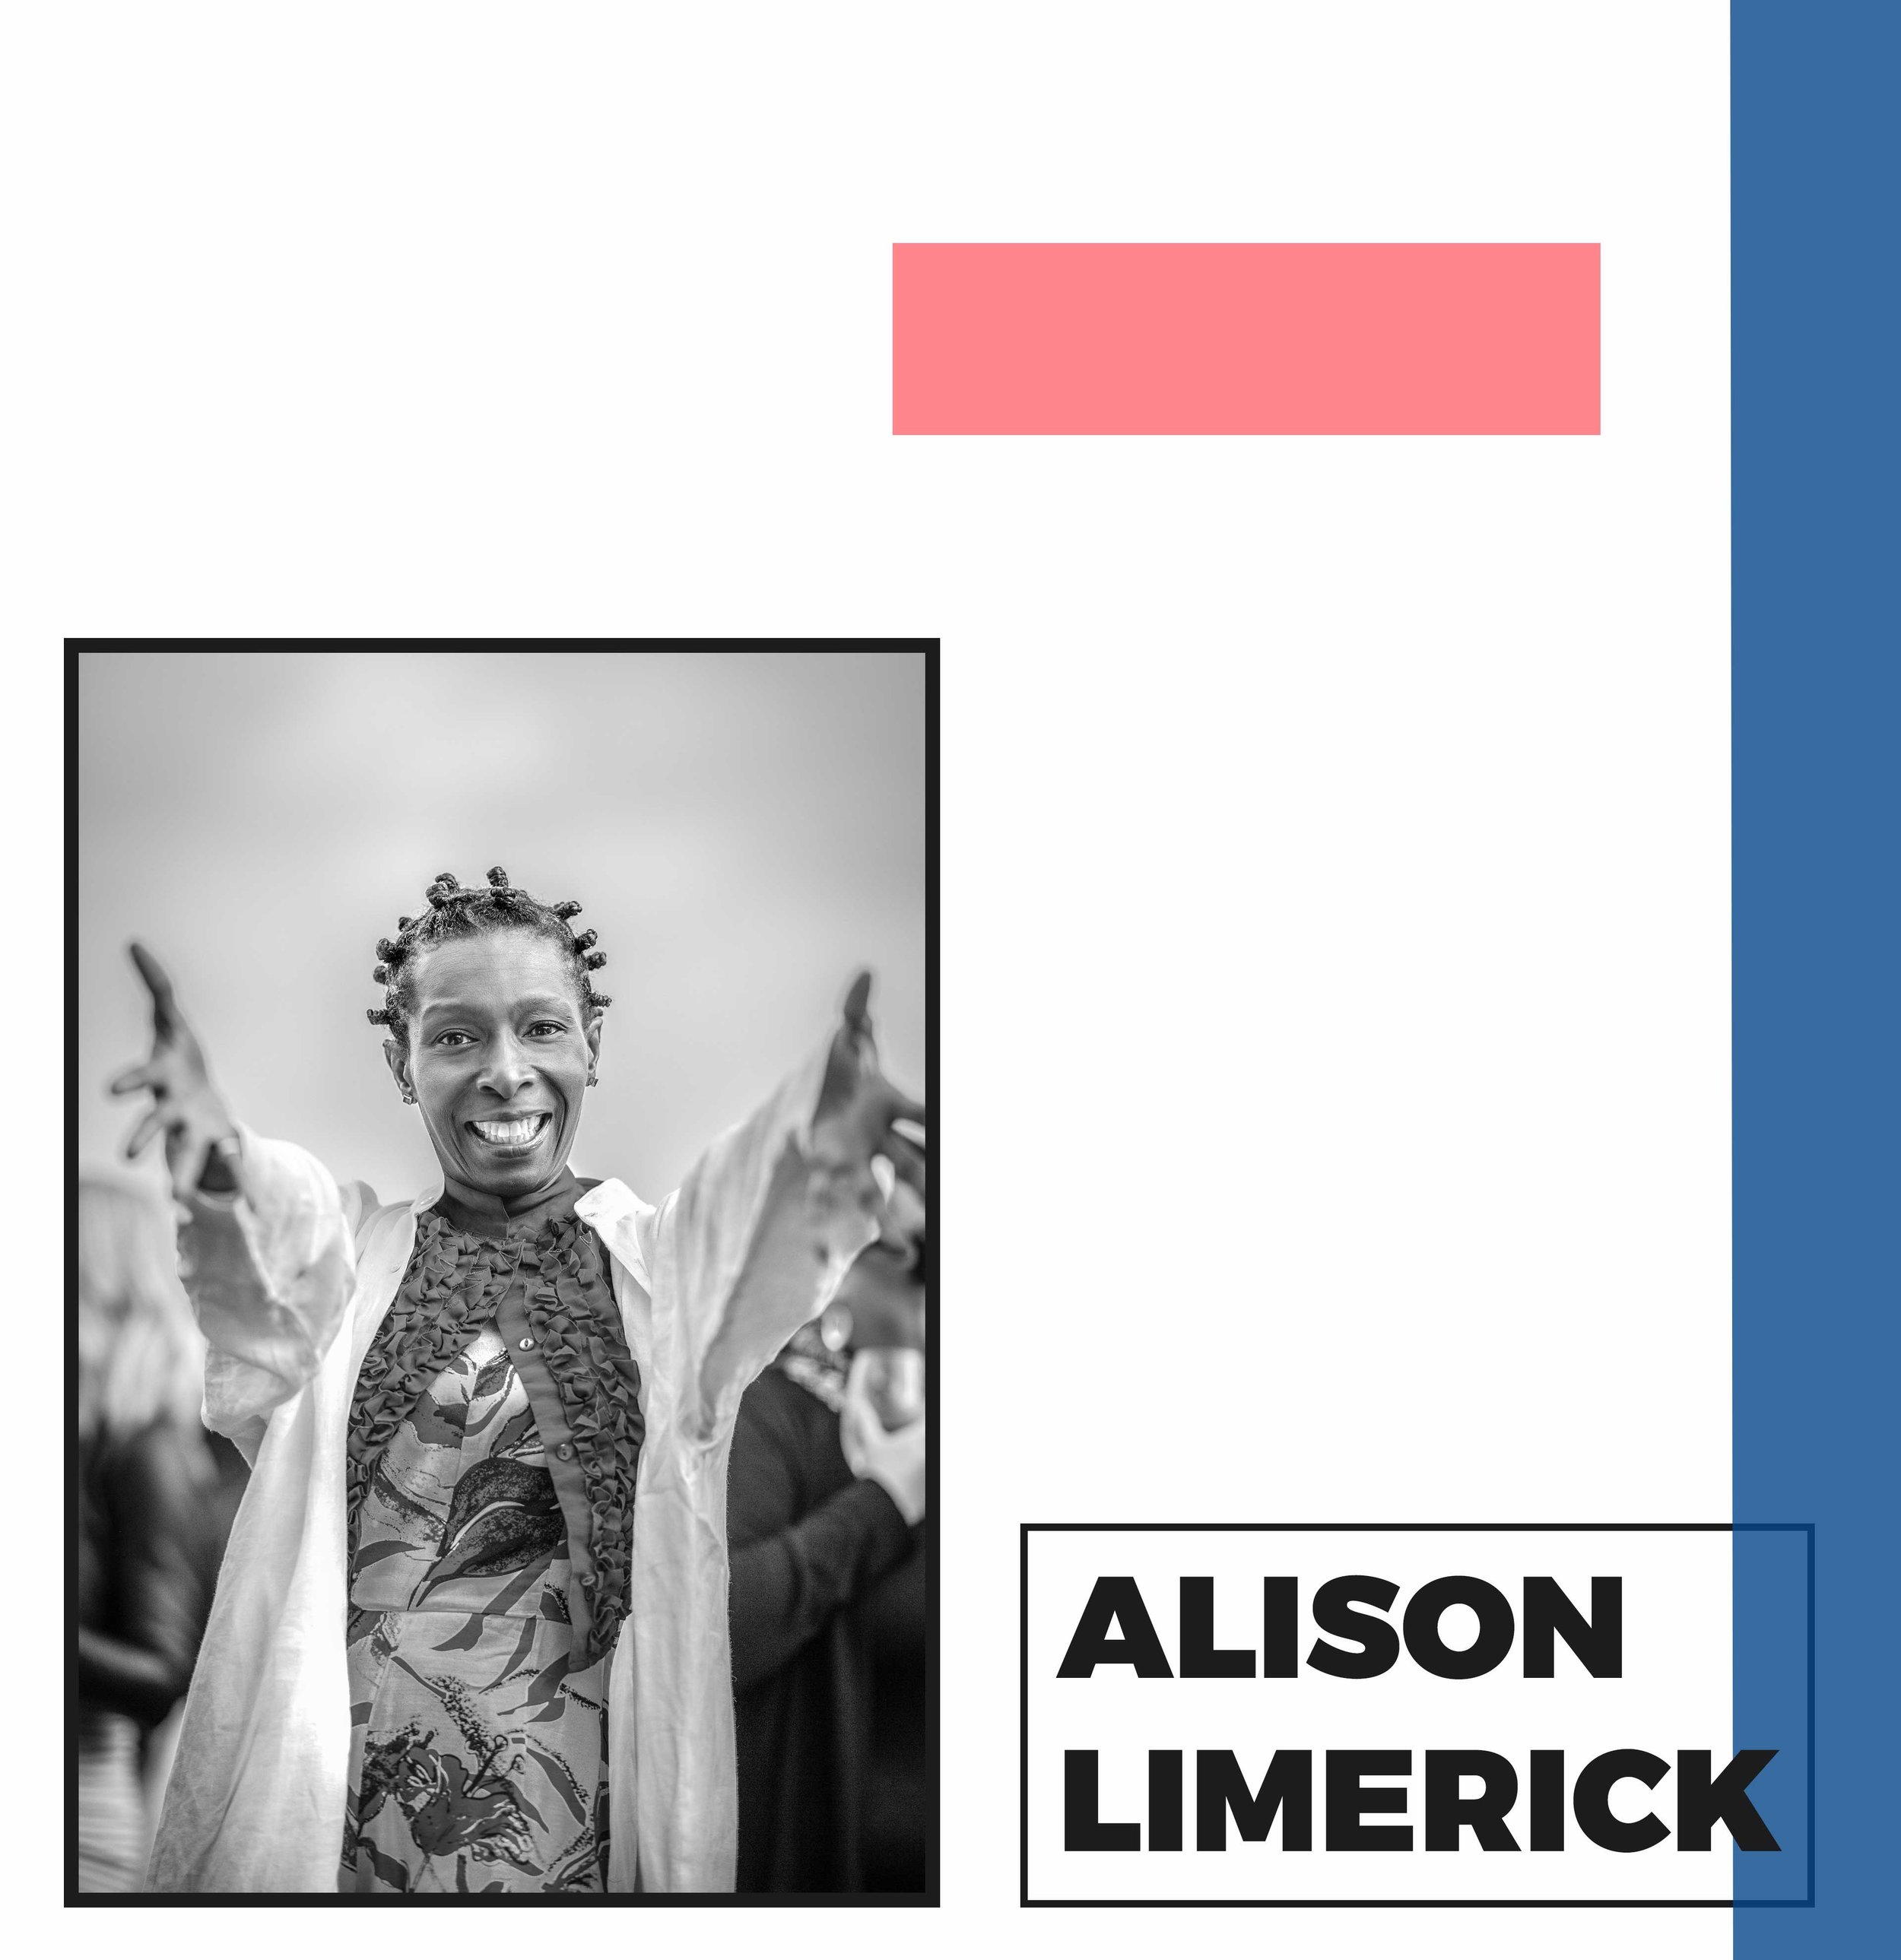 Copy of Alison Limerick